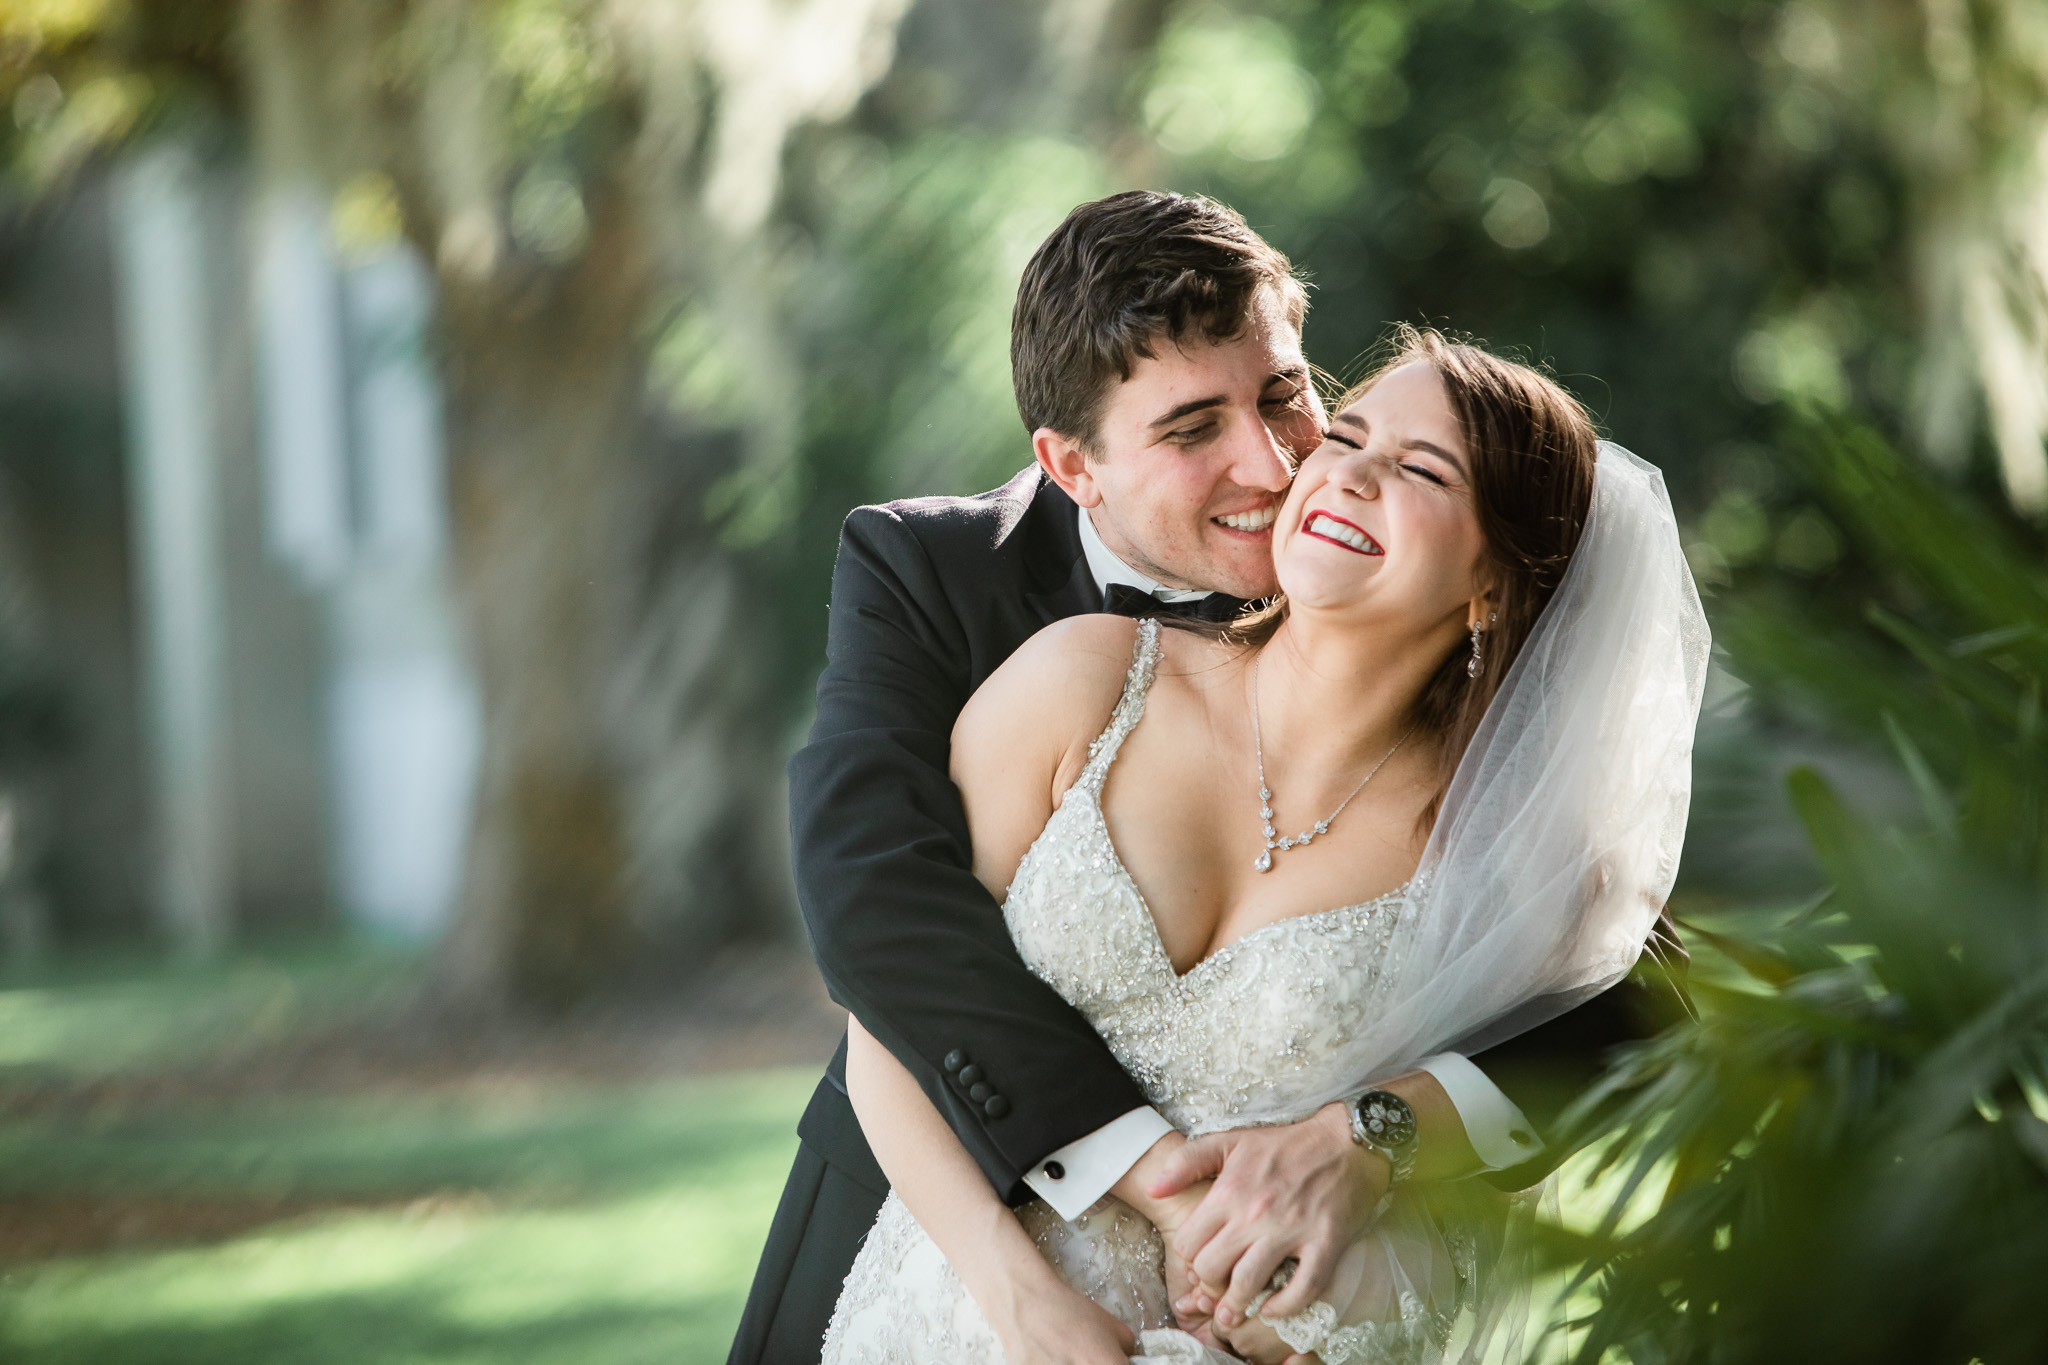 TAMPA_WEDDING_PHOTOGRAPHER_MPMZ_TJL47201_0060.jpg